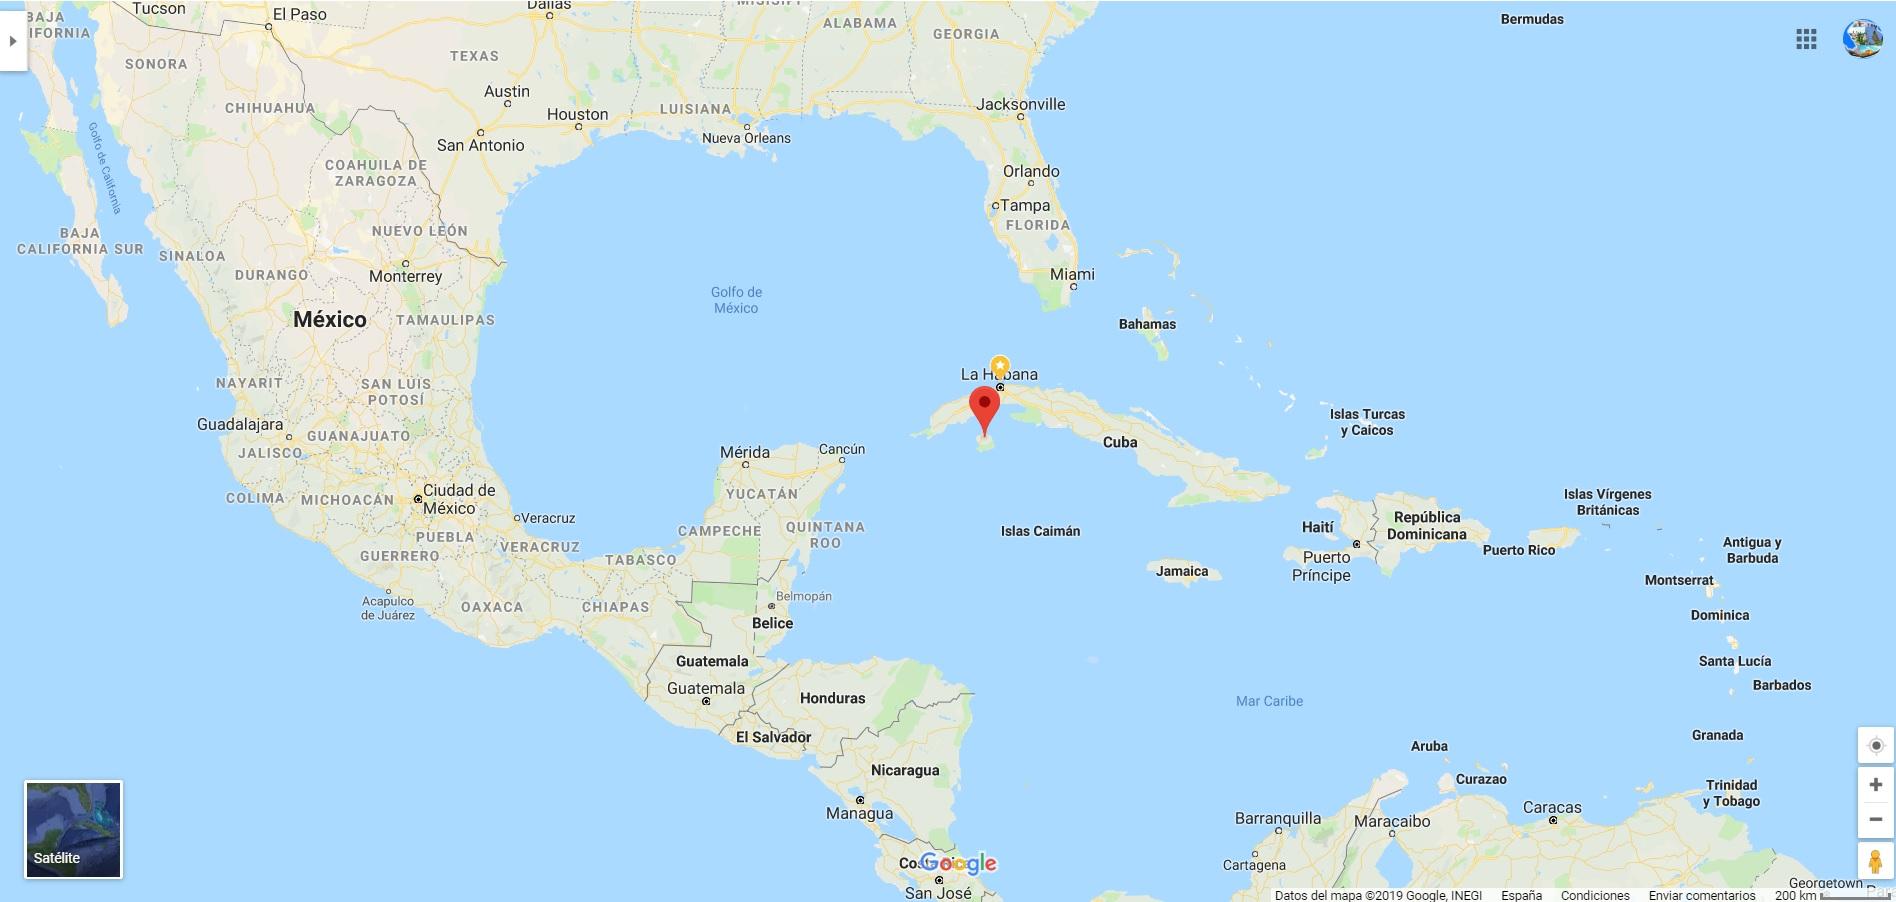 Isla de la Juevntud - Cuba